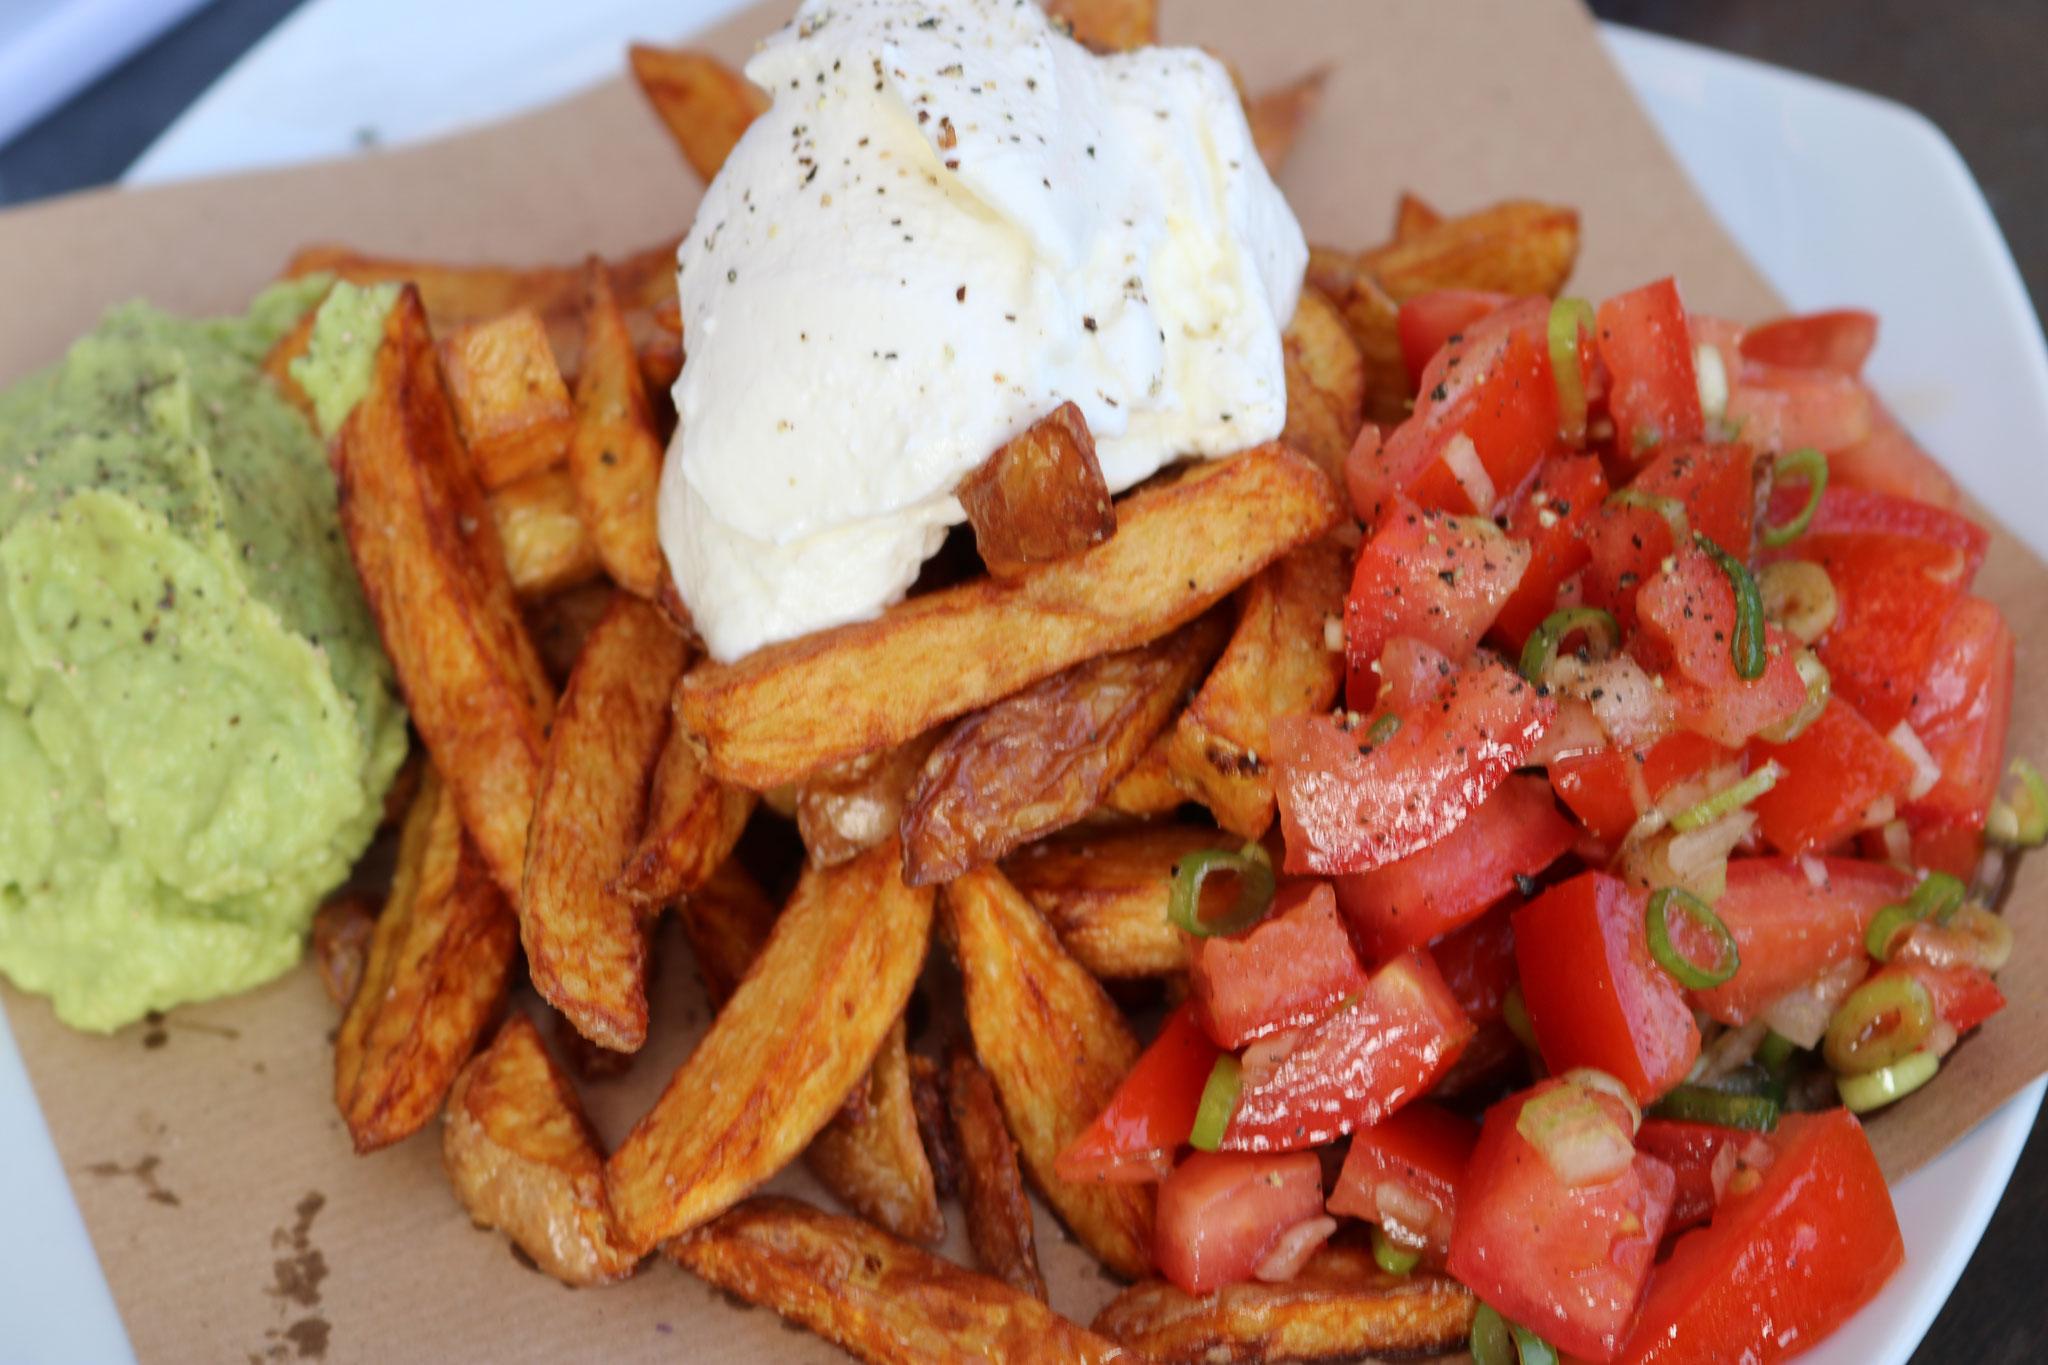 Streetfood - Pommes frites